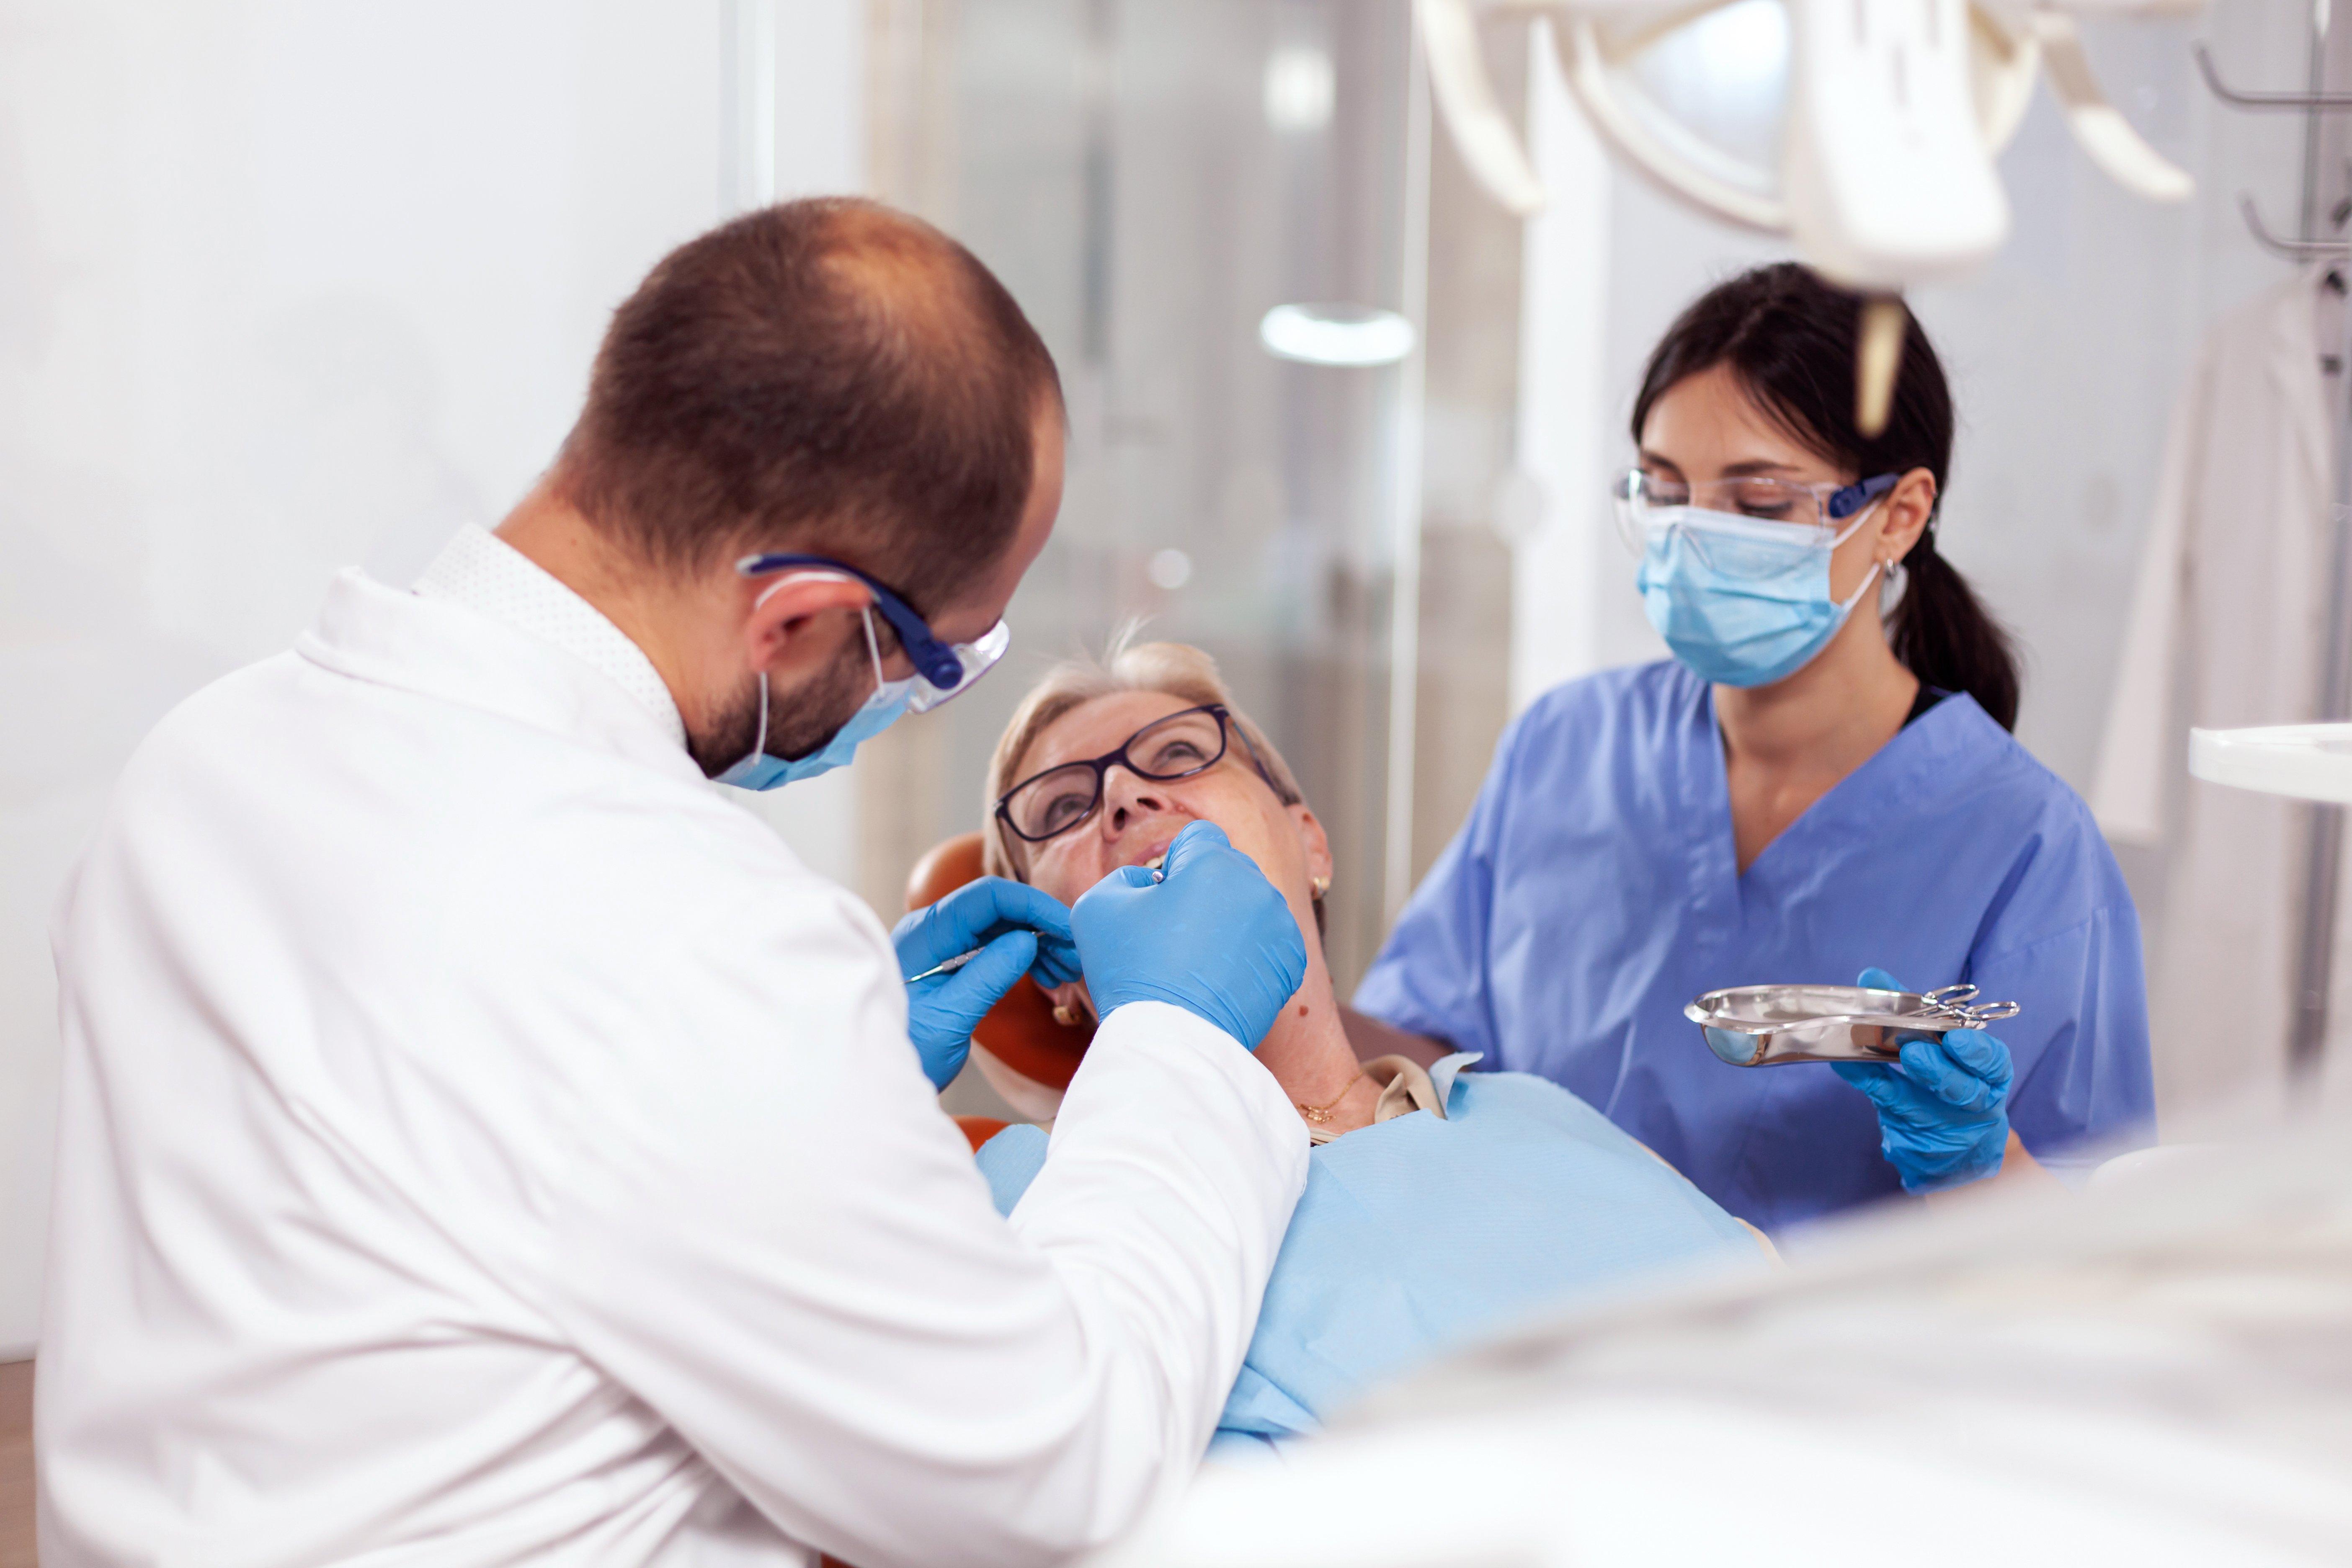 senior-woman-getting-stomatology-treatment-N9DK3F4